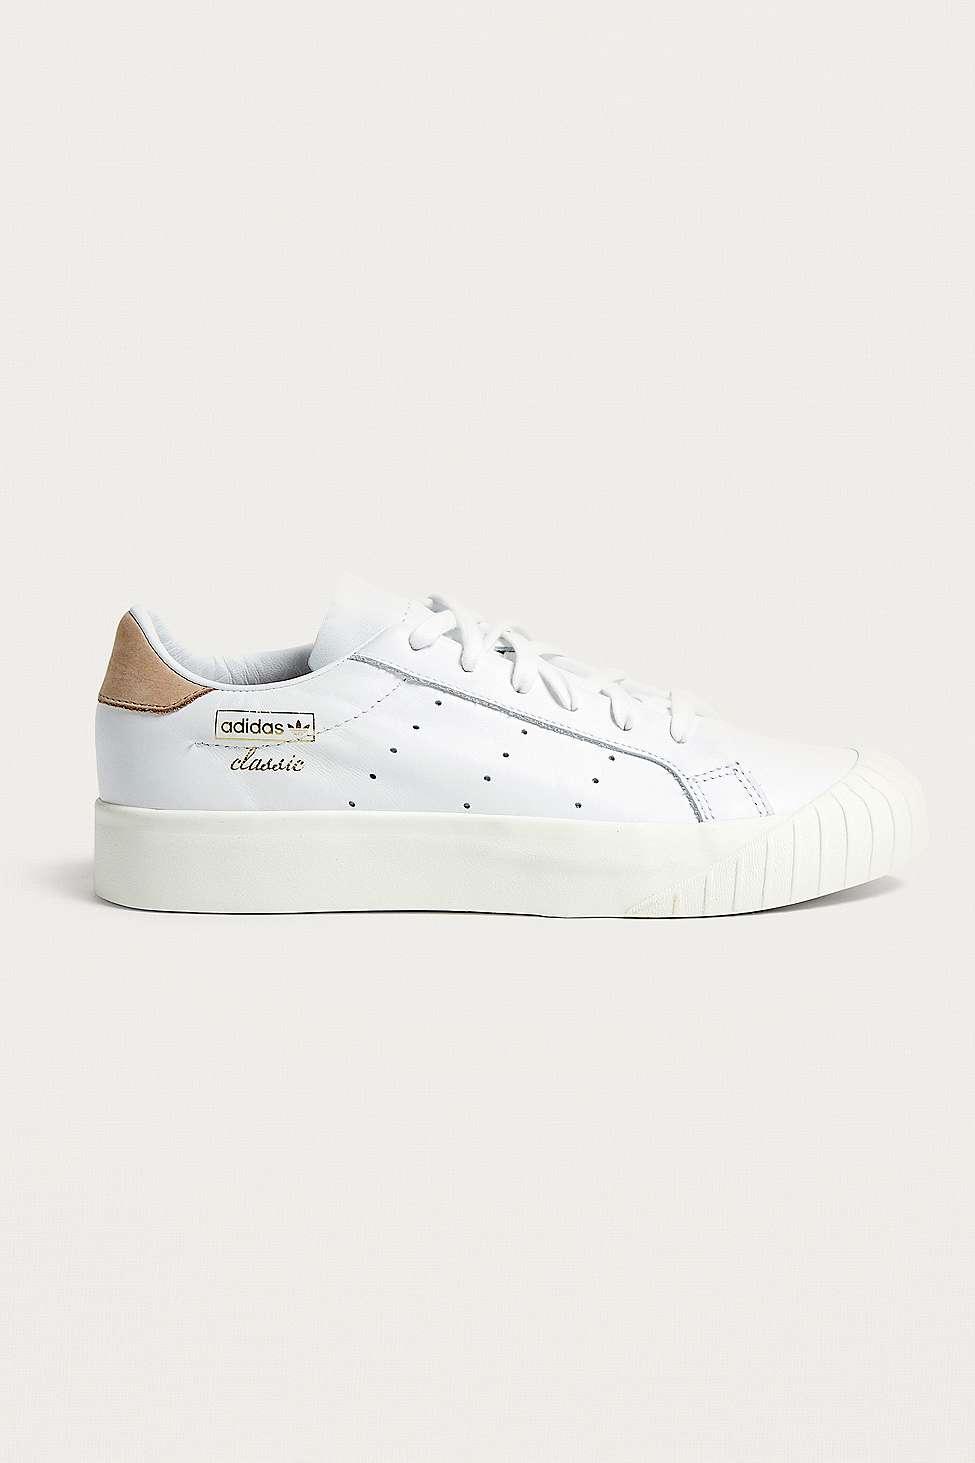 Adidas Originali Outfitters Everyn White Formatori Urban Outfitters Originali a93802